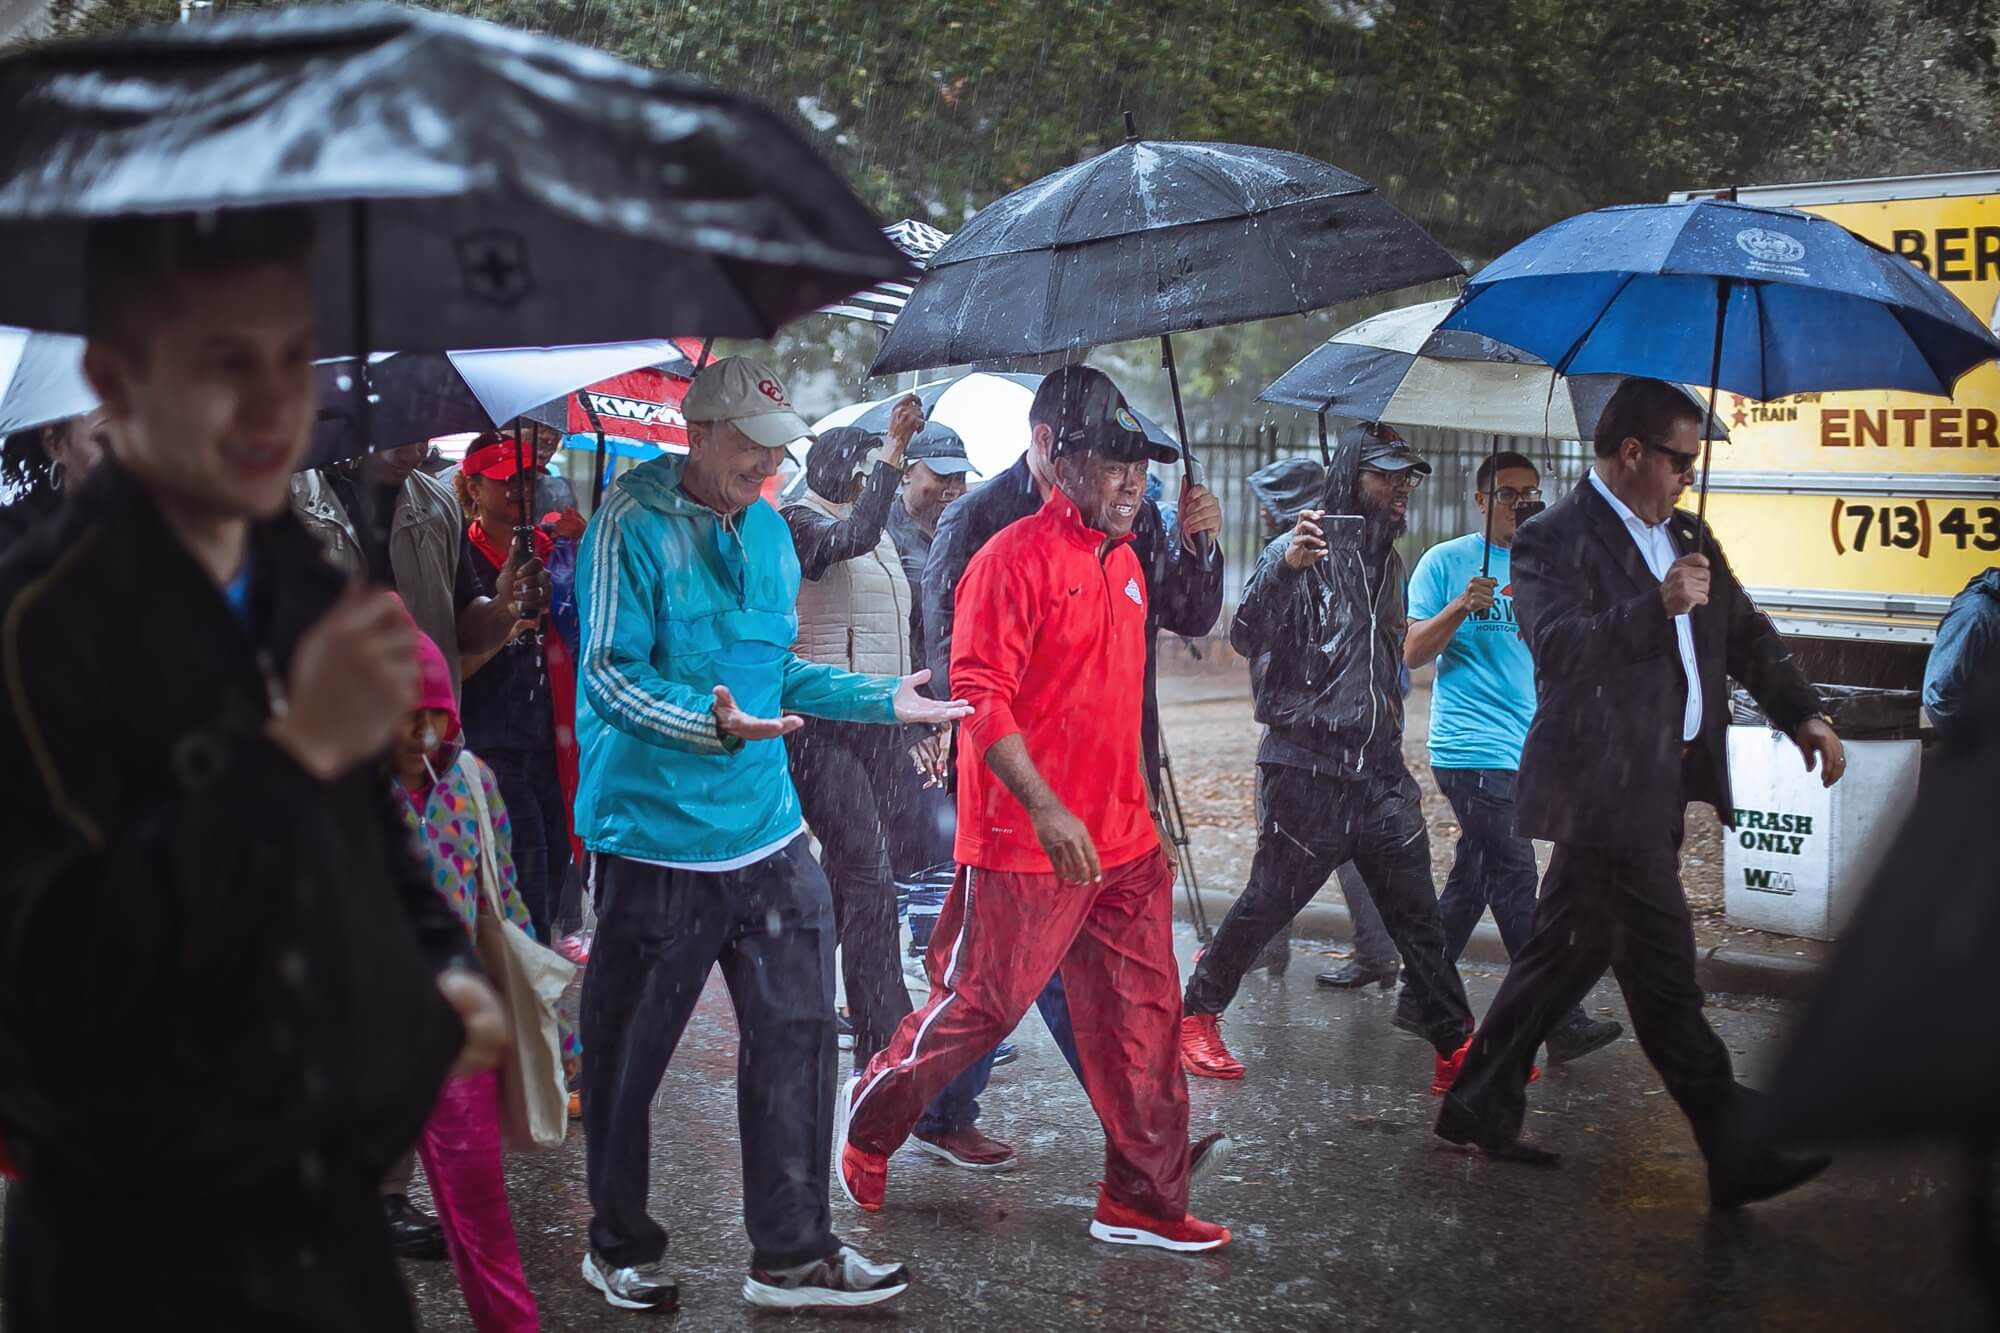 Walkers make their way through the annual 5k. (Photo credit: Morris Malakoff)